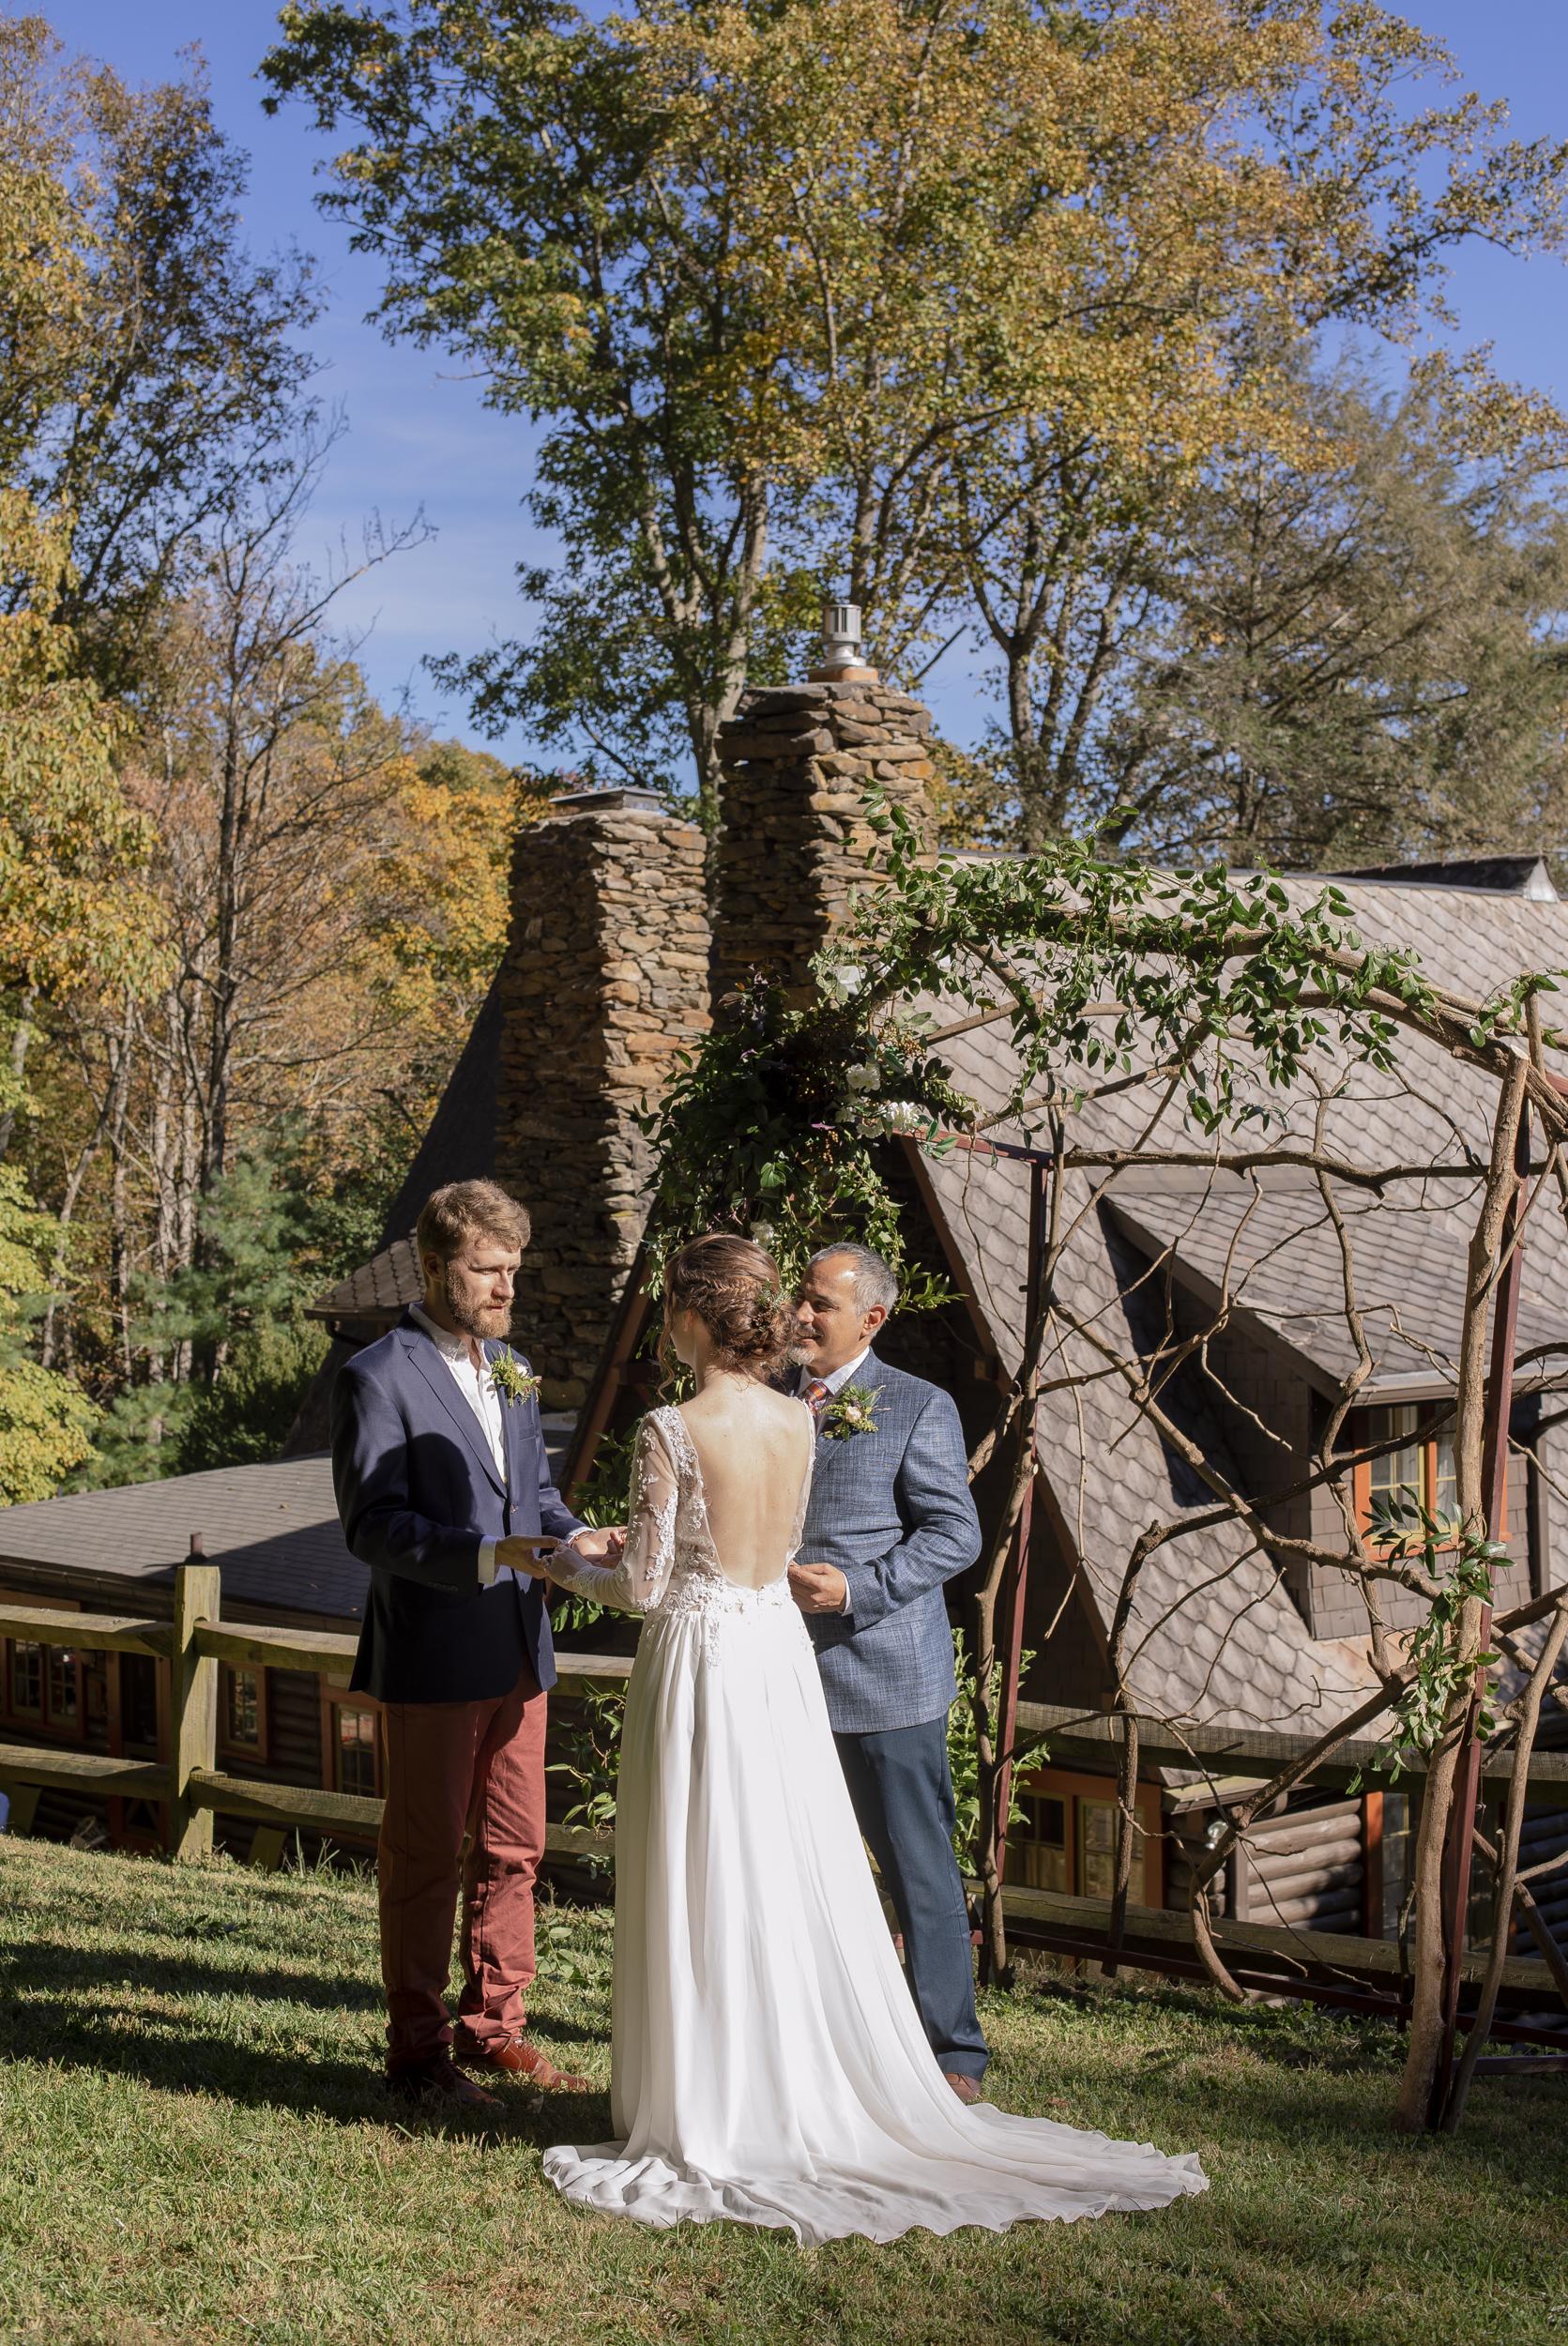 Laurel Falls Wedding October 2018_Allison and Josh__Lola Salon_Flora_Photo by Studio Misha Photography-30.jpg